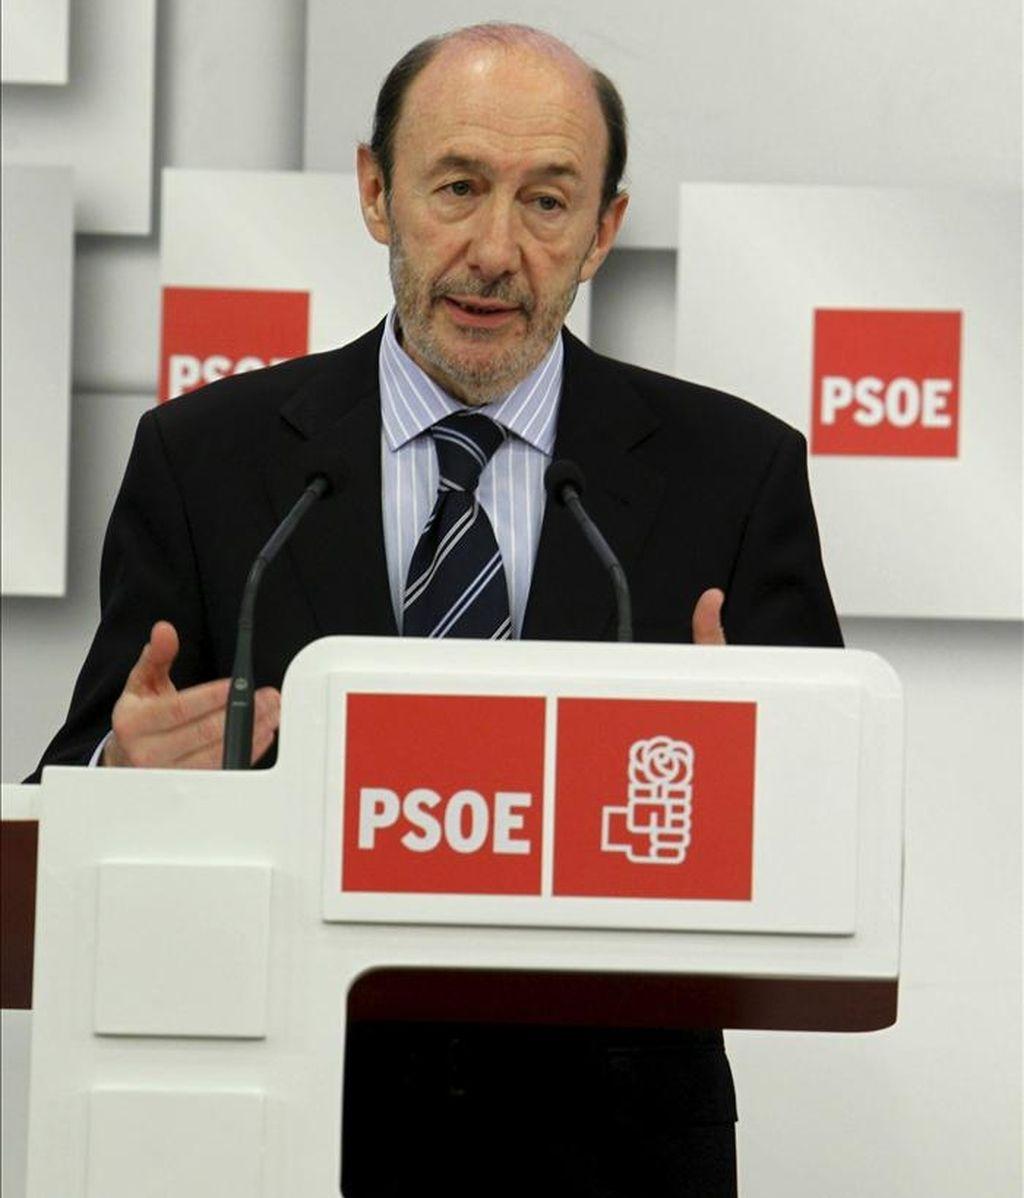 En la imagen, Alfredo Perez Rubalcaba. EFE/Archivo